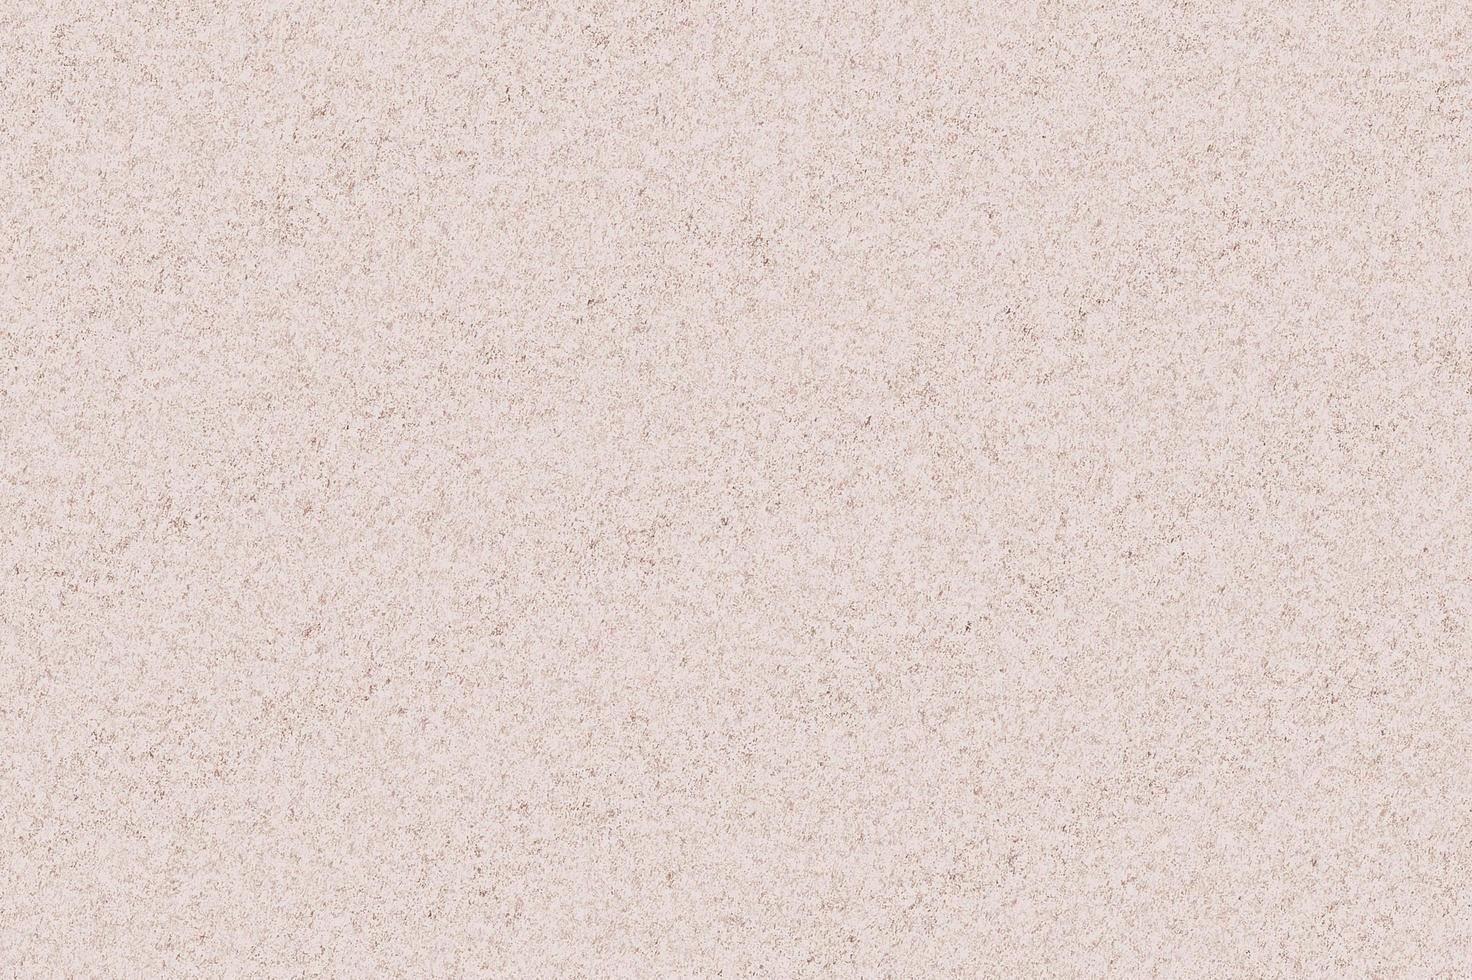 helle beige Vintage Textur foto